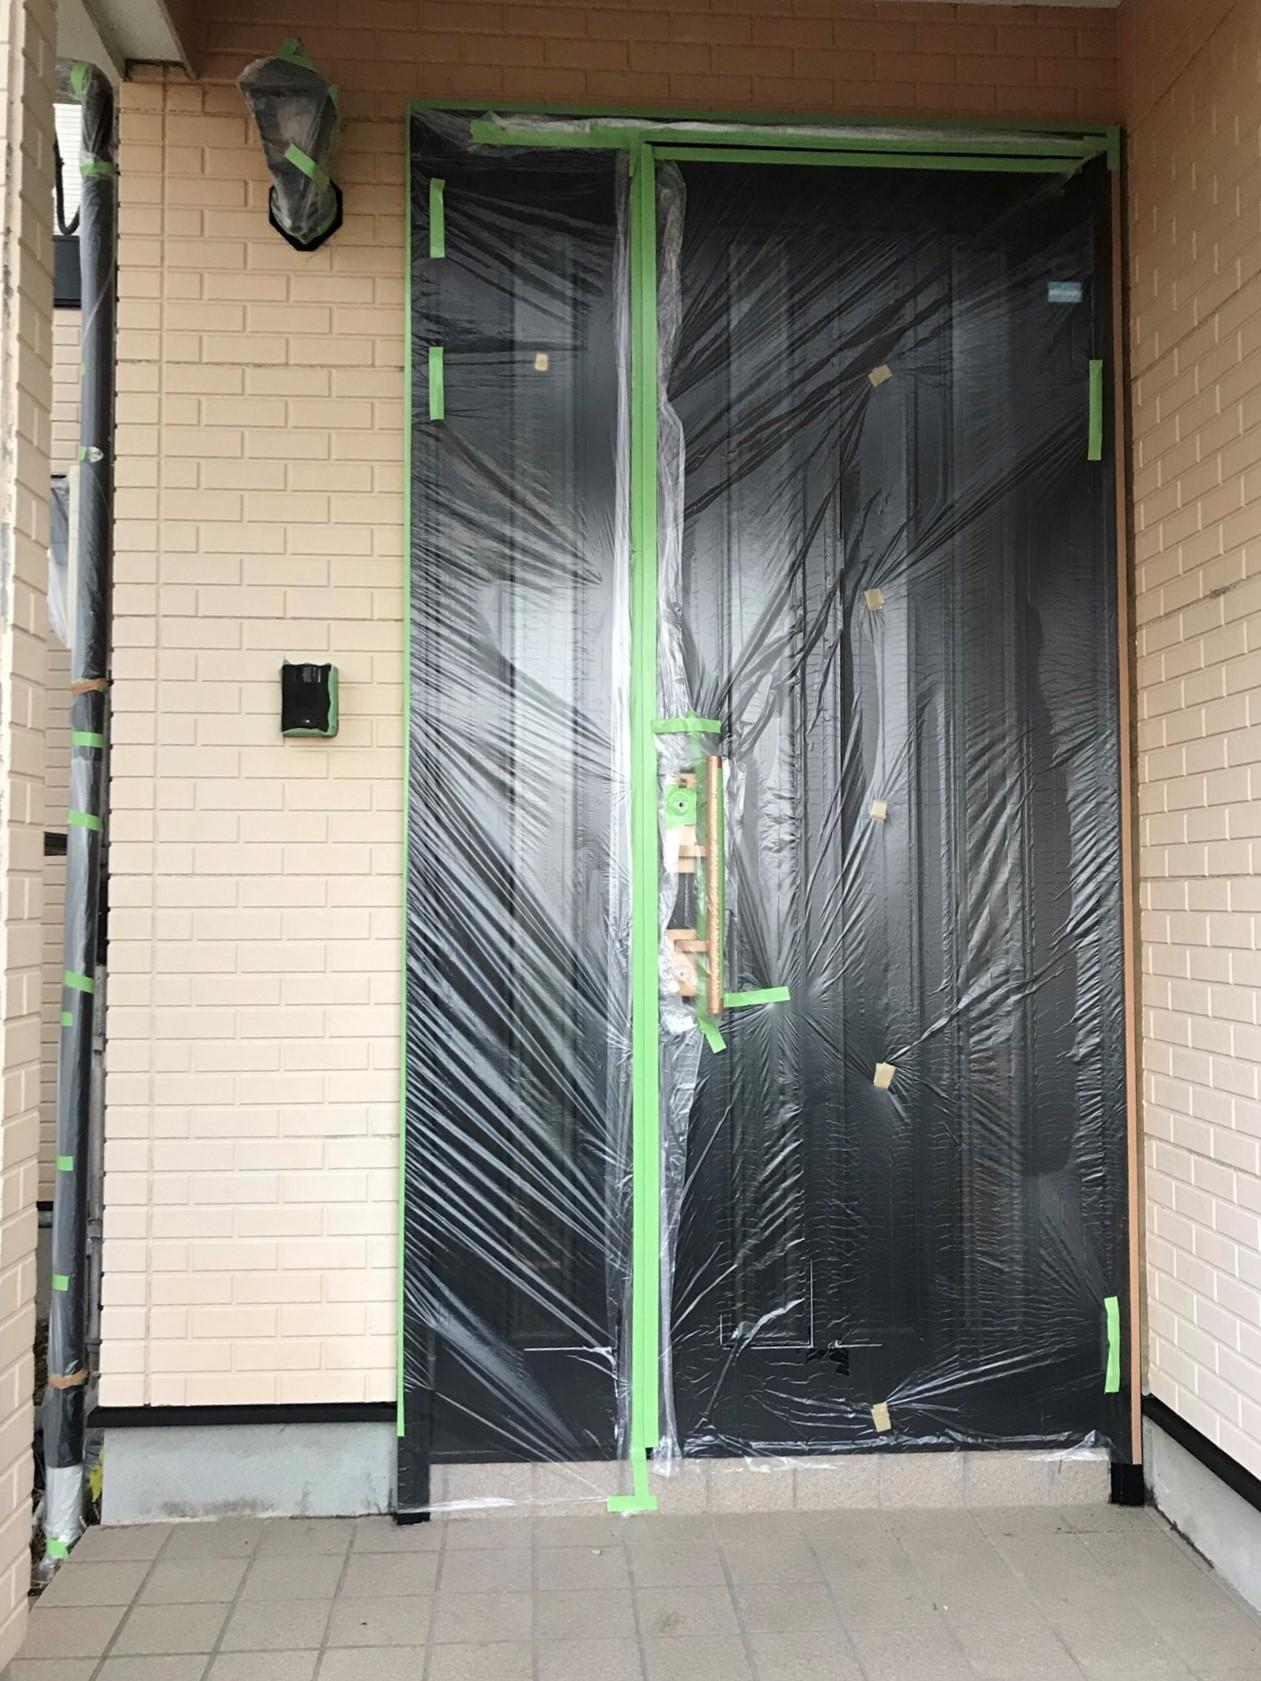 伊奈町賃貸一軒家外壁塗装の為の養生作業